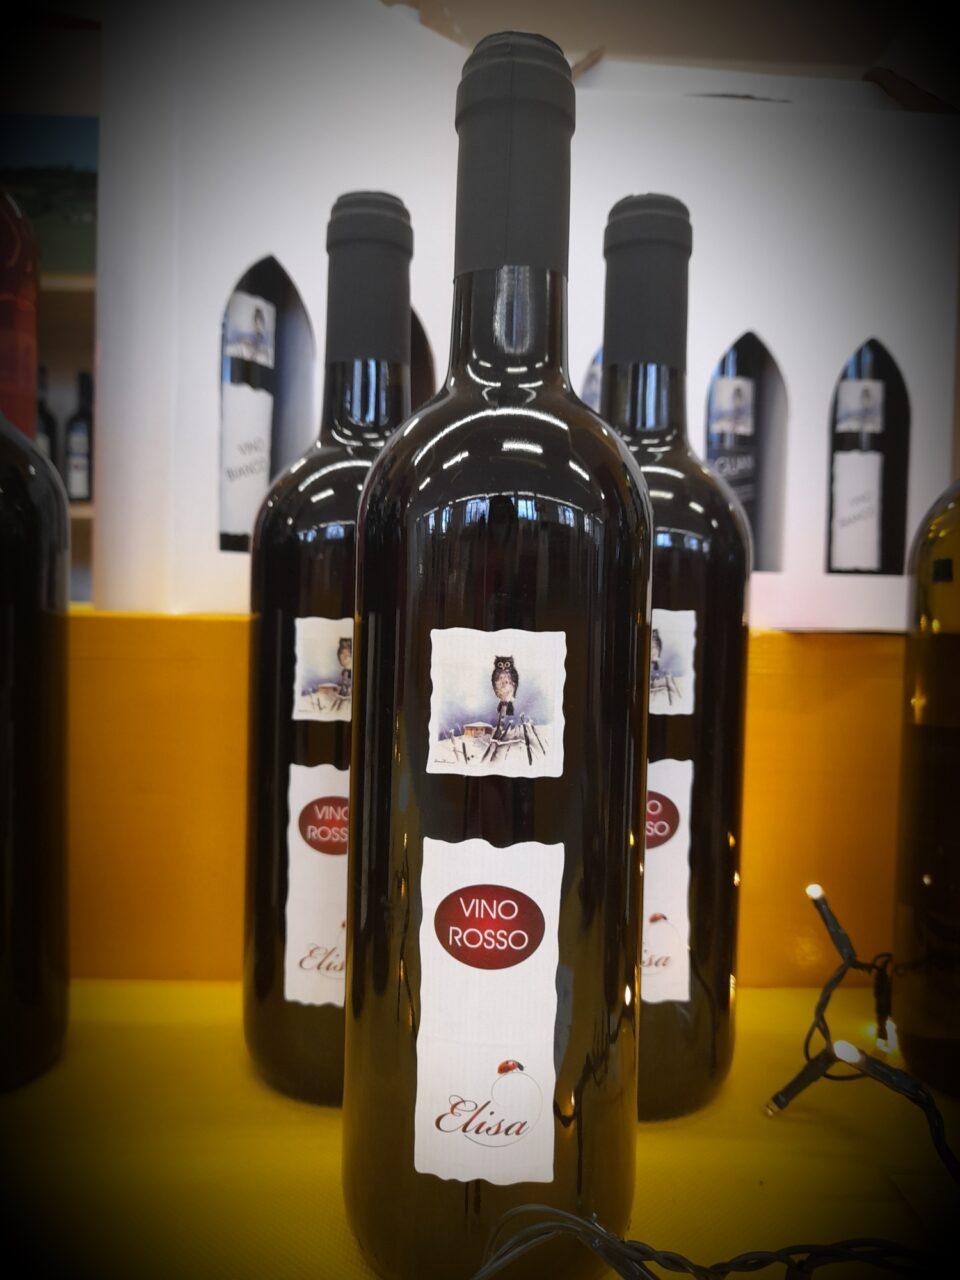 bottiglie di Vino rosso Elisa